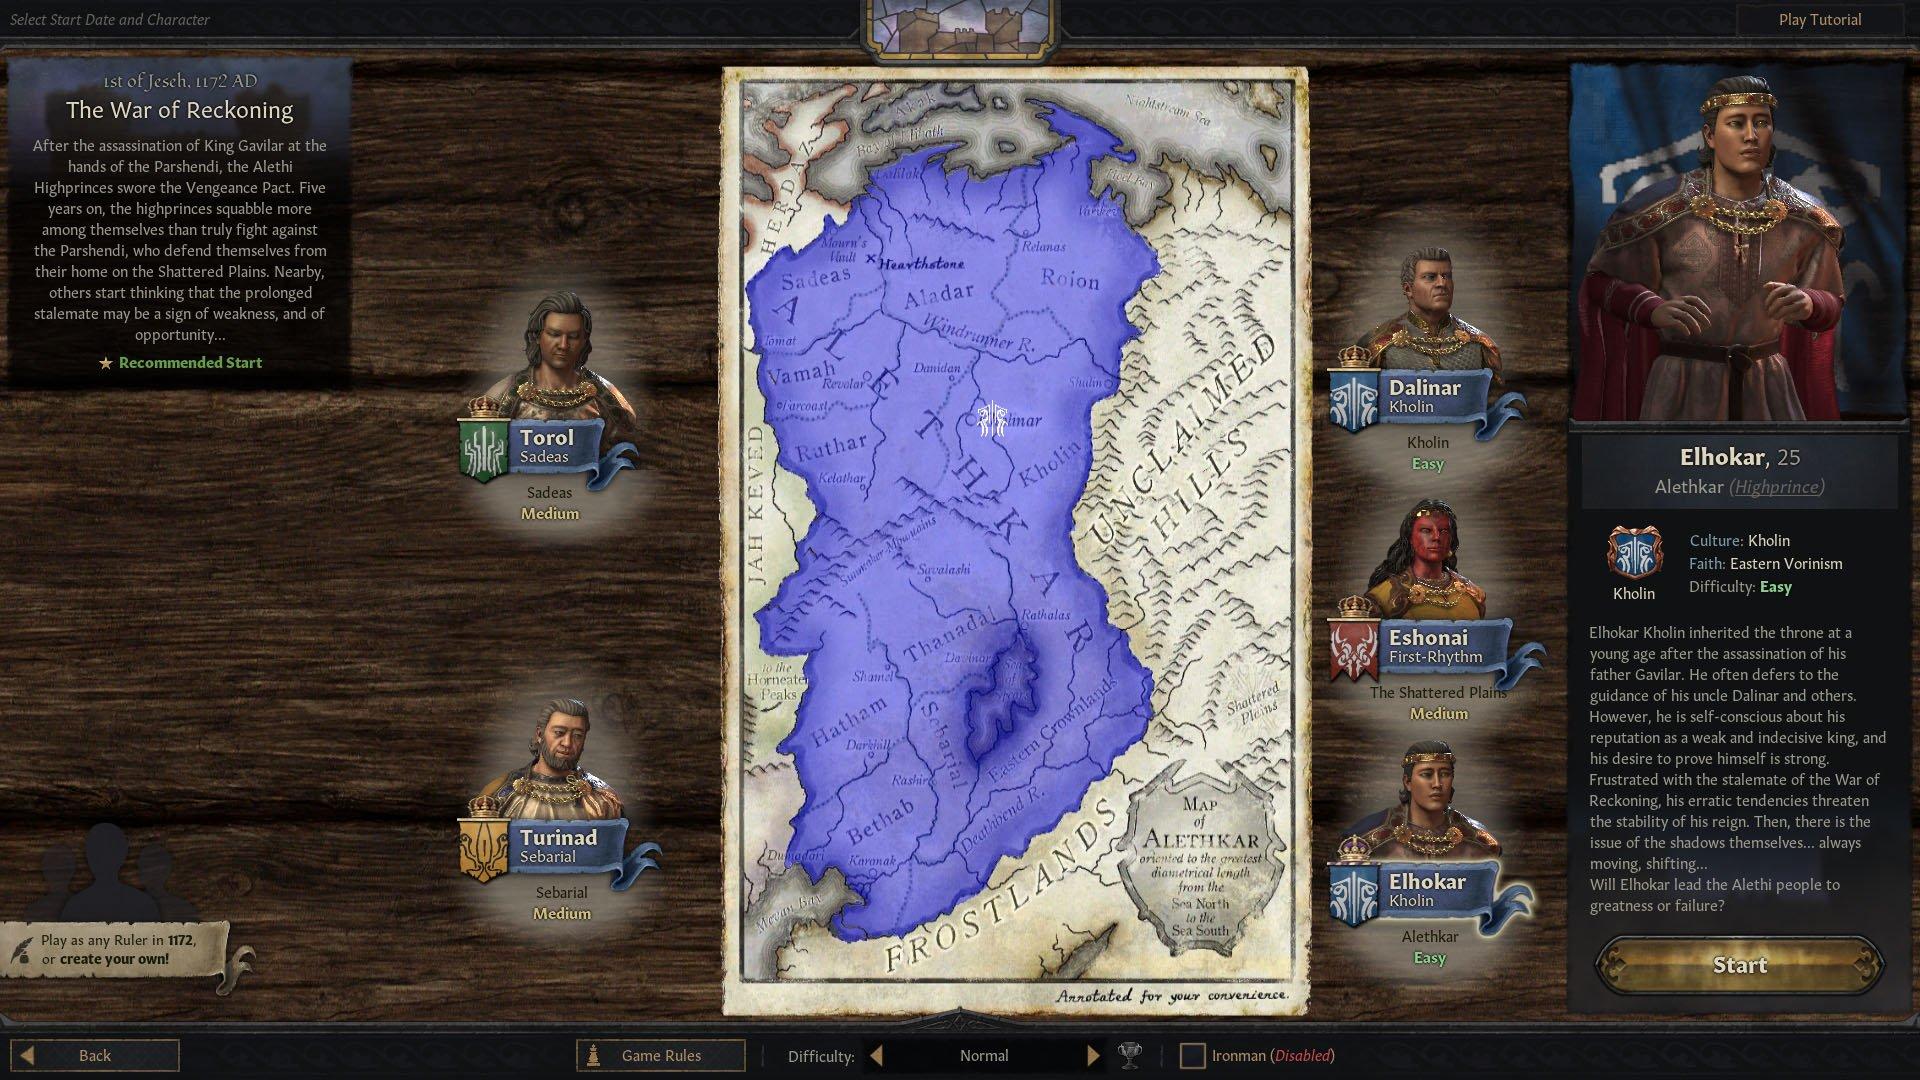 دانلود مد The Way of Kings برای بازی Crusader Kings III